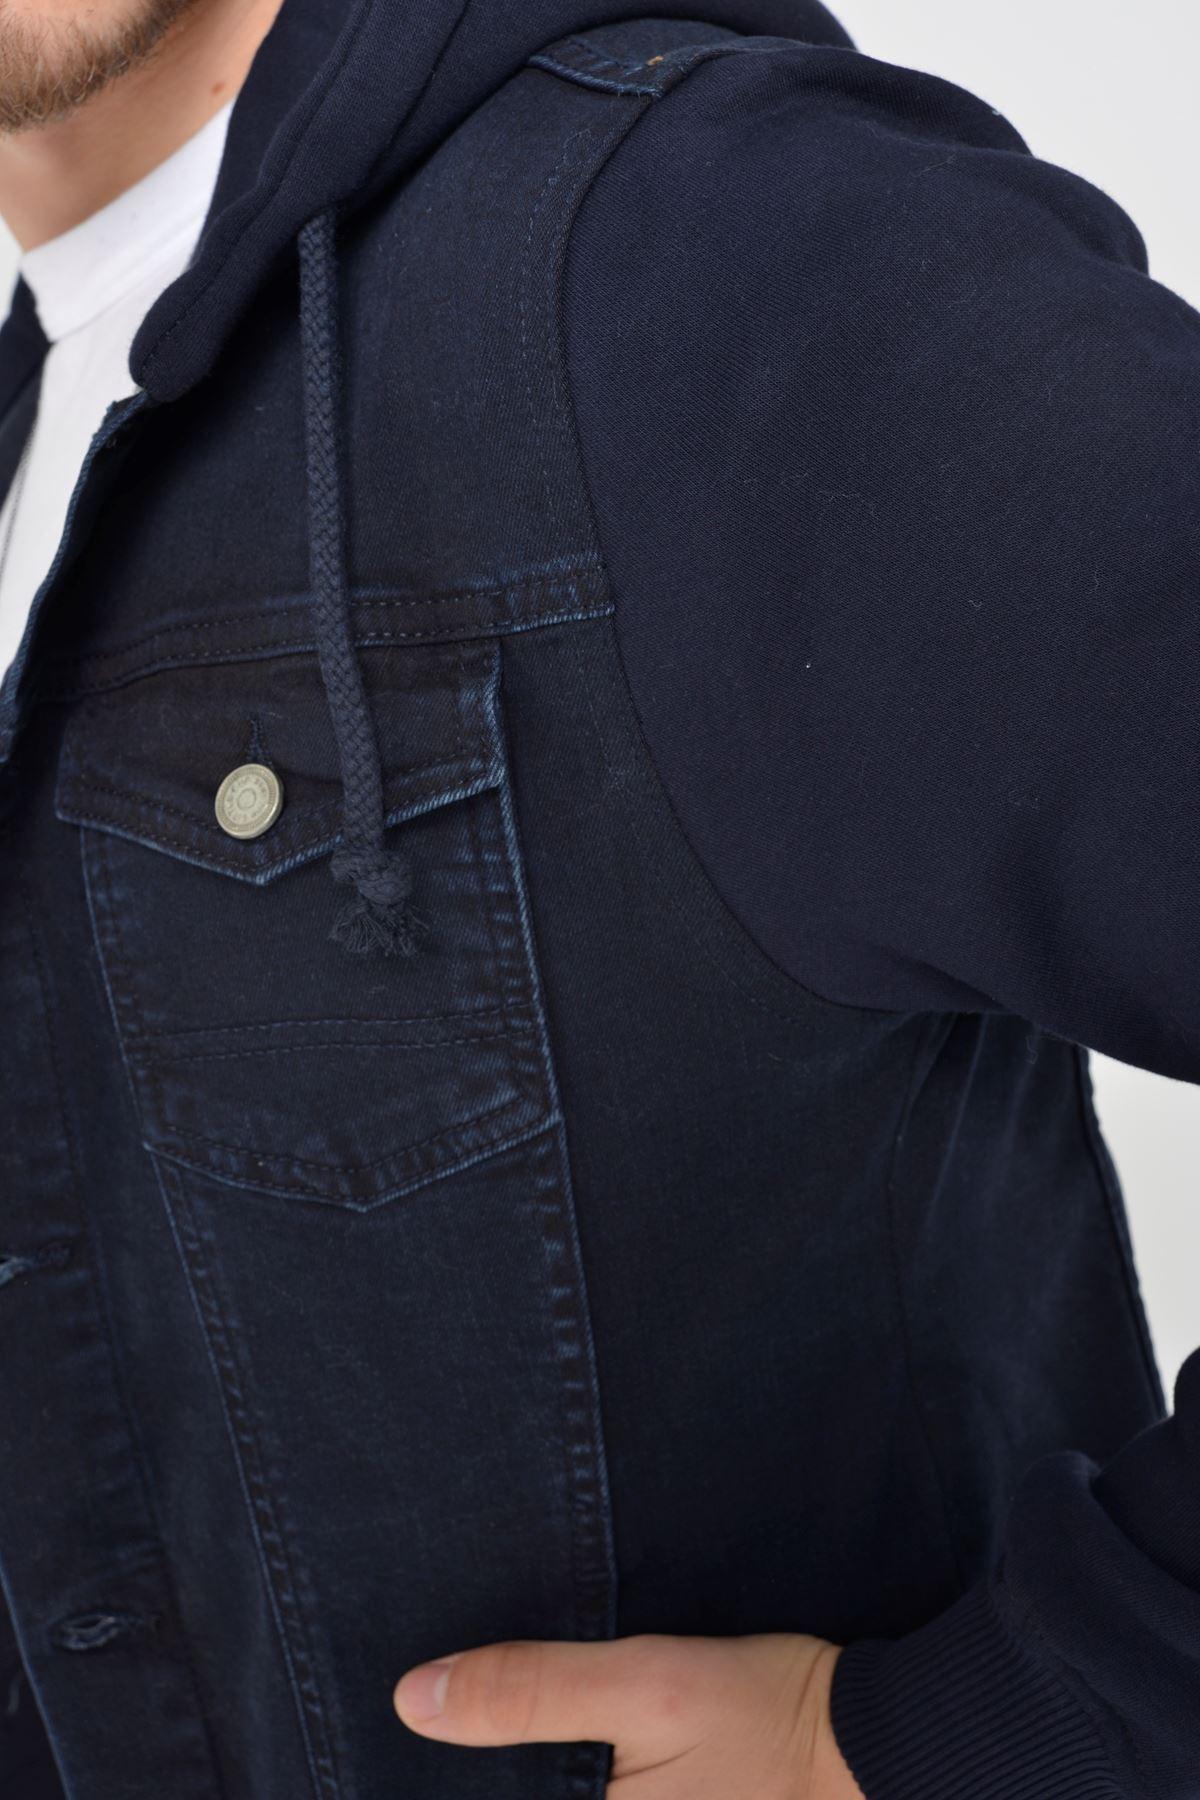 Lacivert Polar Kol Lacivert Kapüşonlu Düğmeli Erkek Kot Ceket